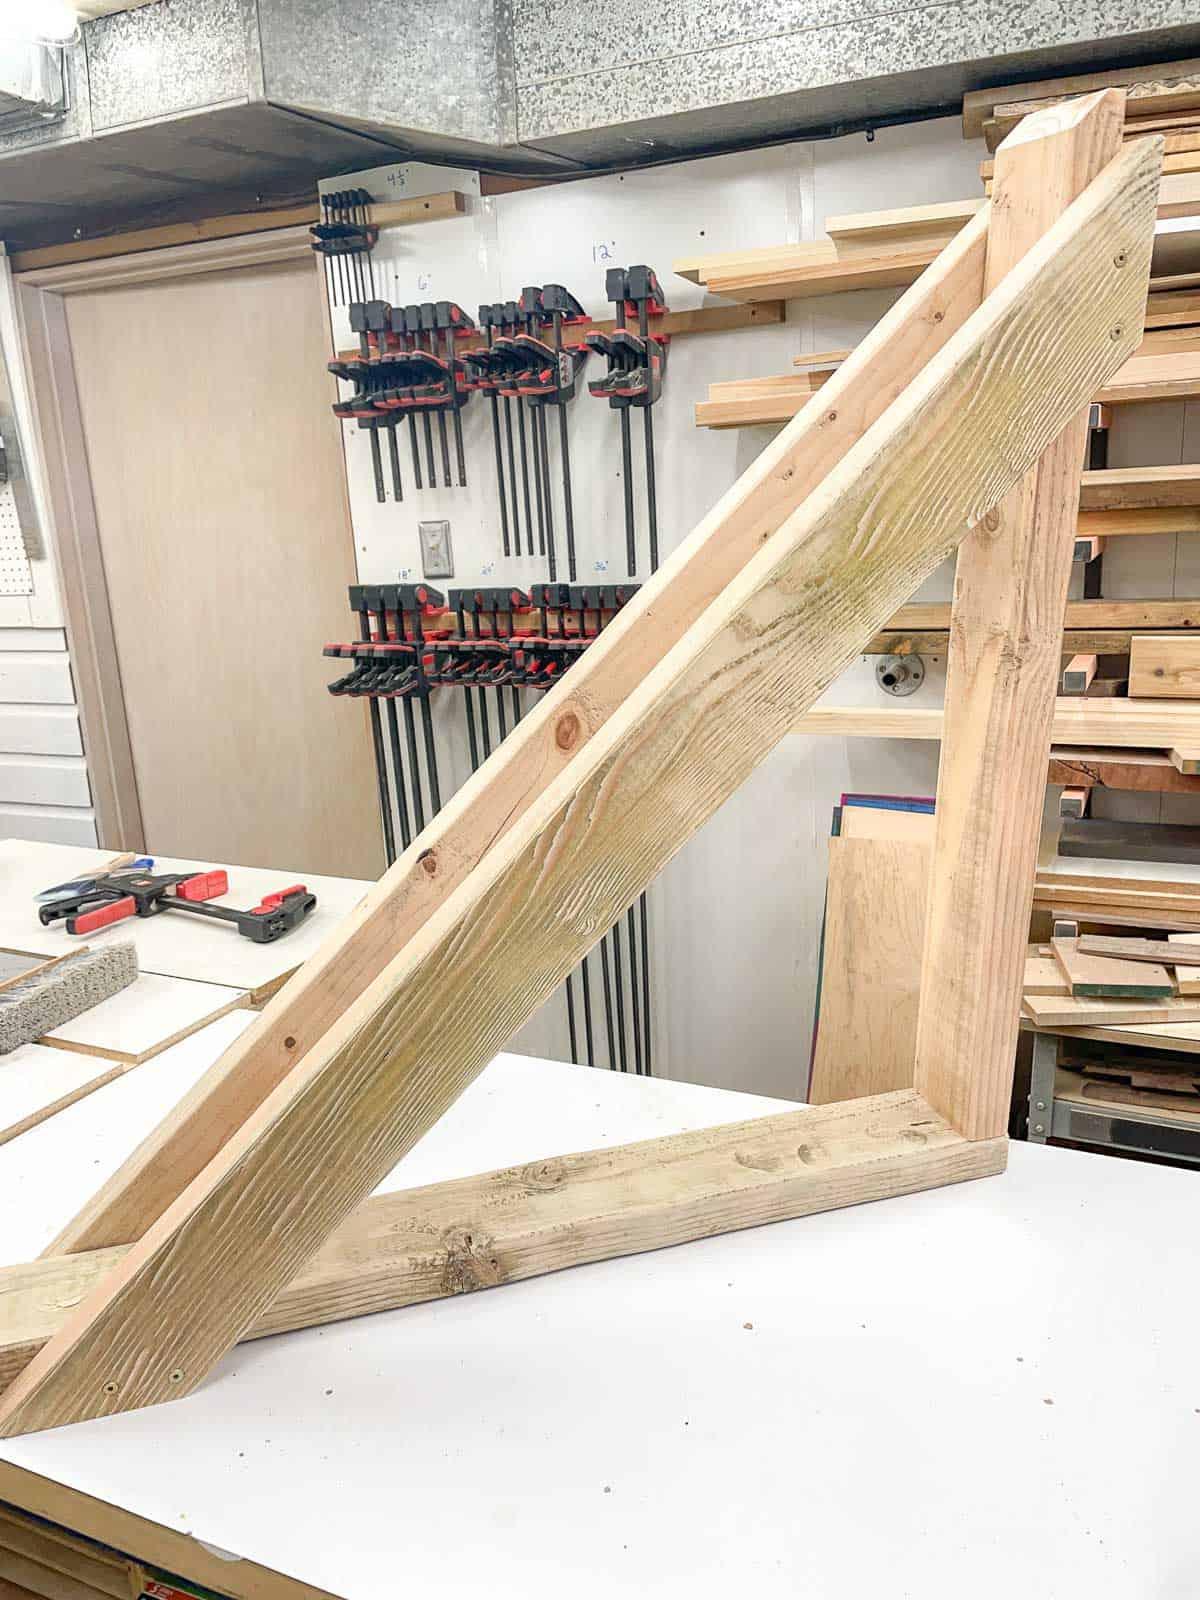 DIY wood bike rack assembled on workbench